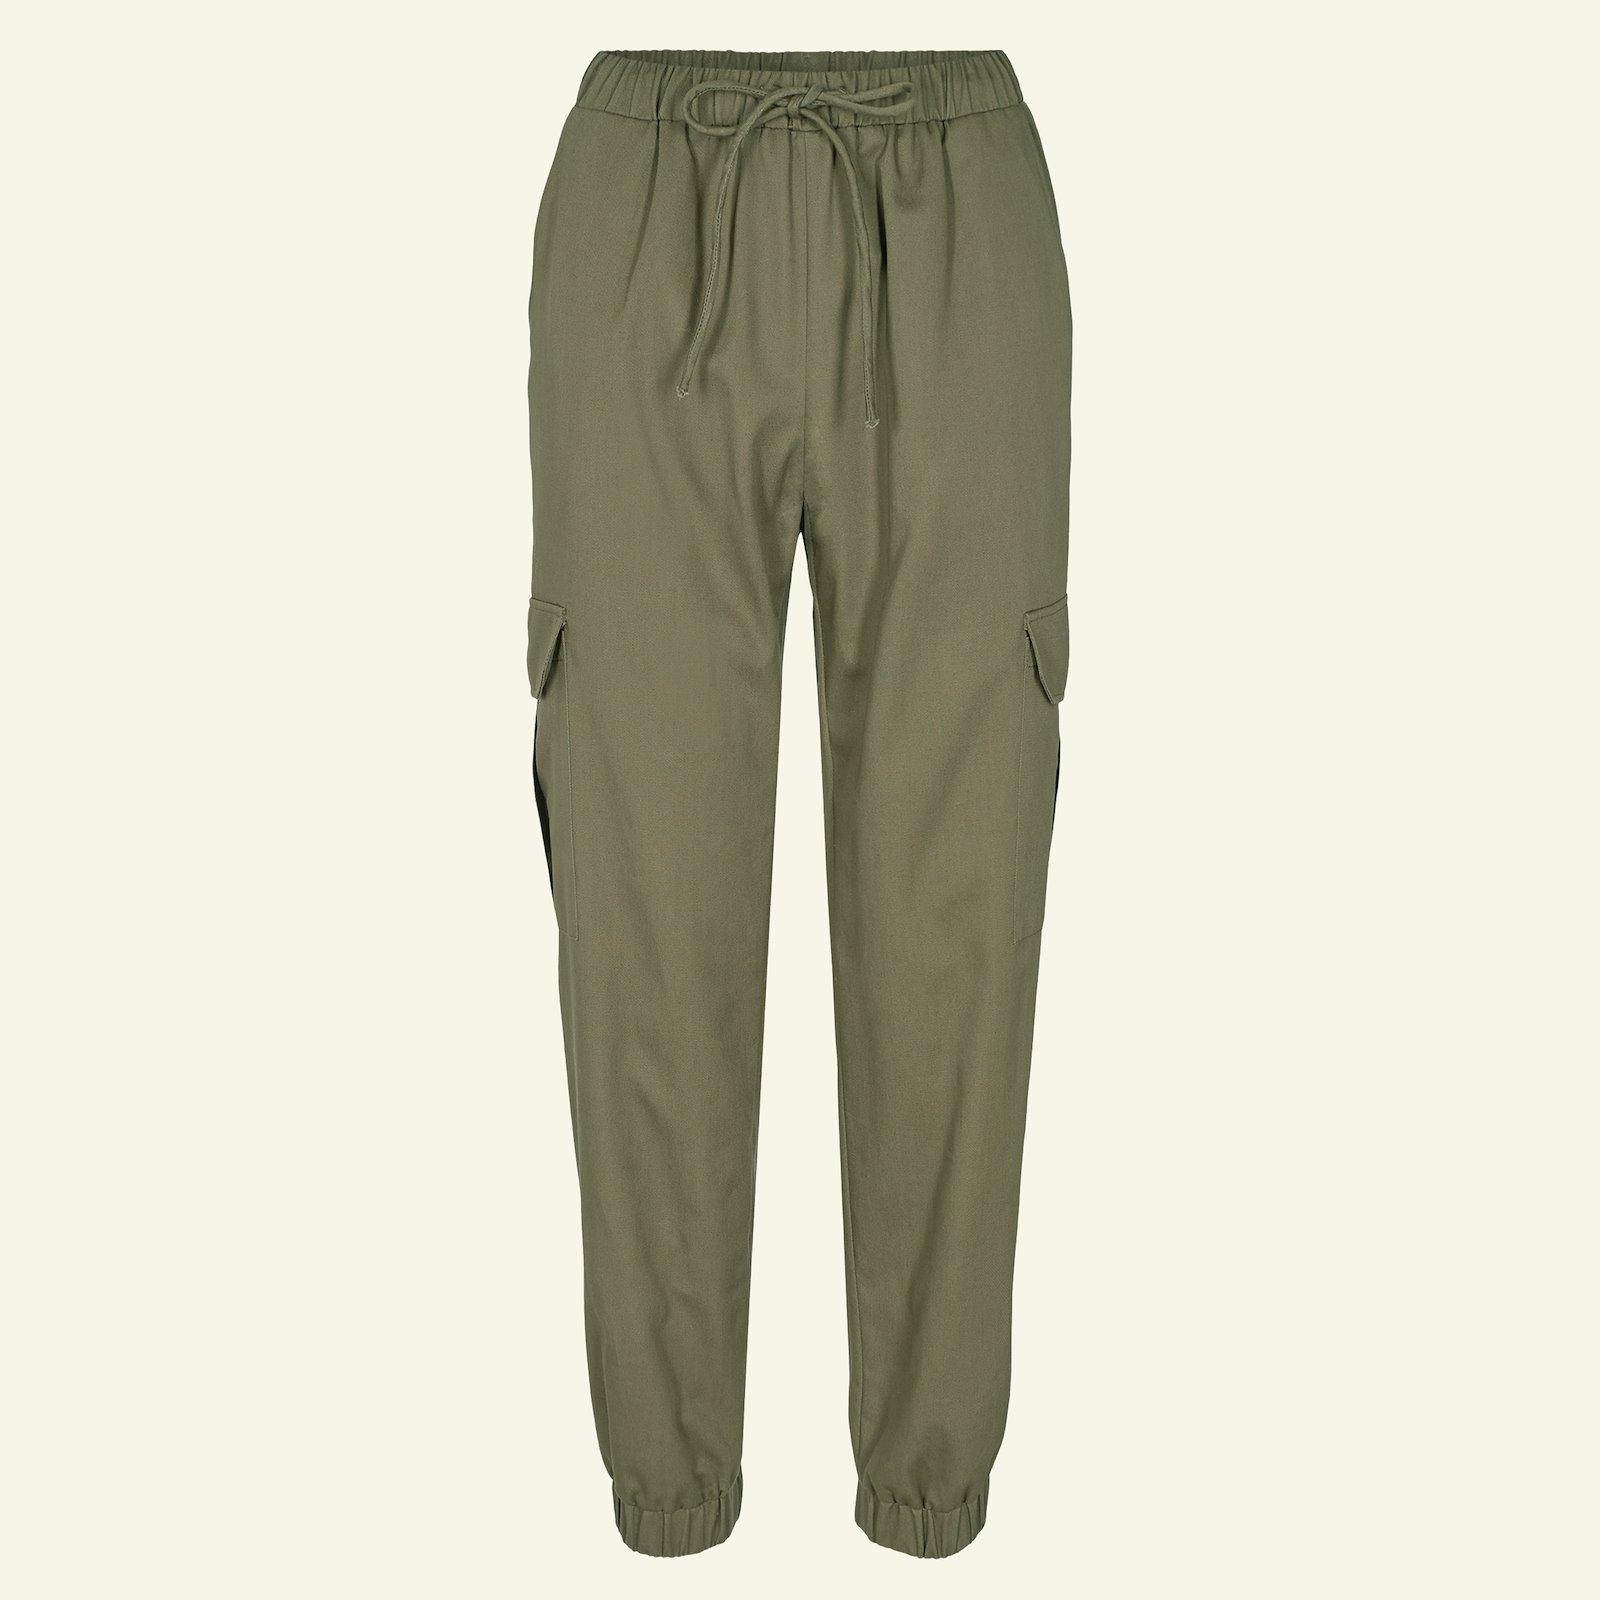 Cargo trousers, 34/6 p20054_420174_40243_sskit